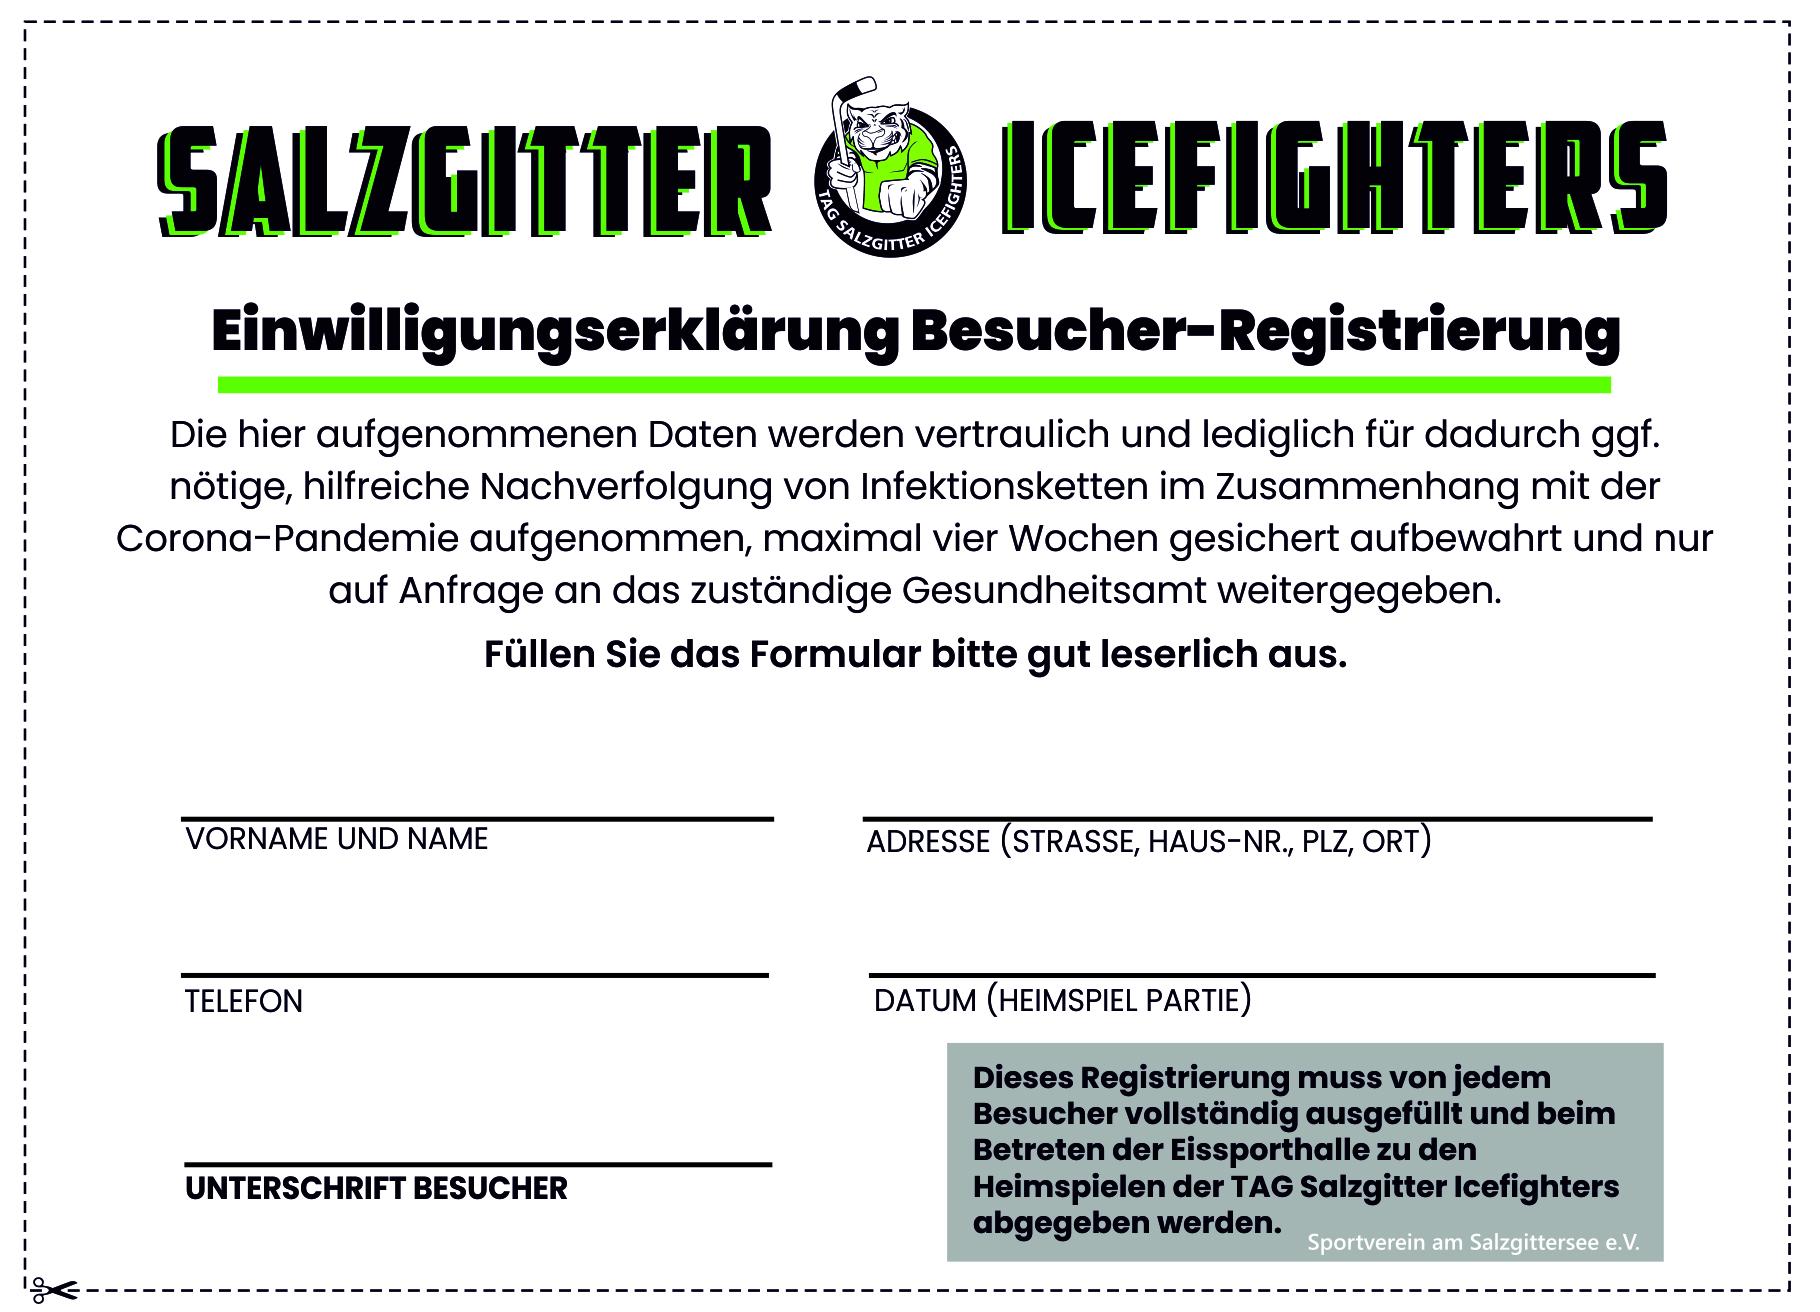 Icefighters Corona Registrierung 2020 JPG